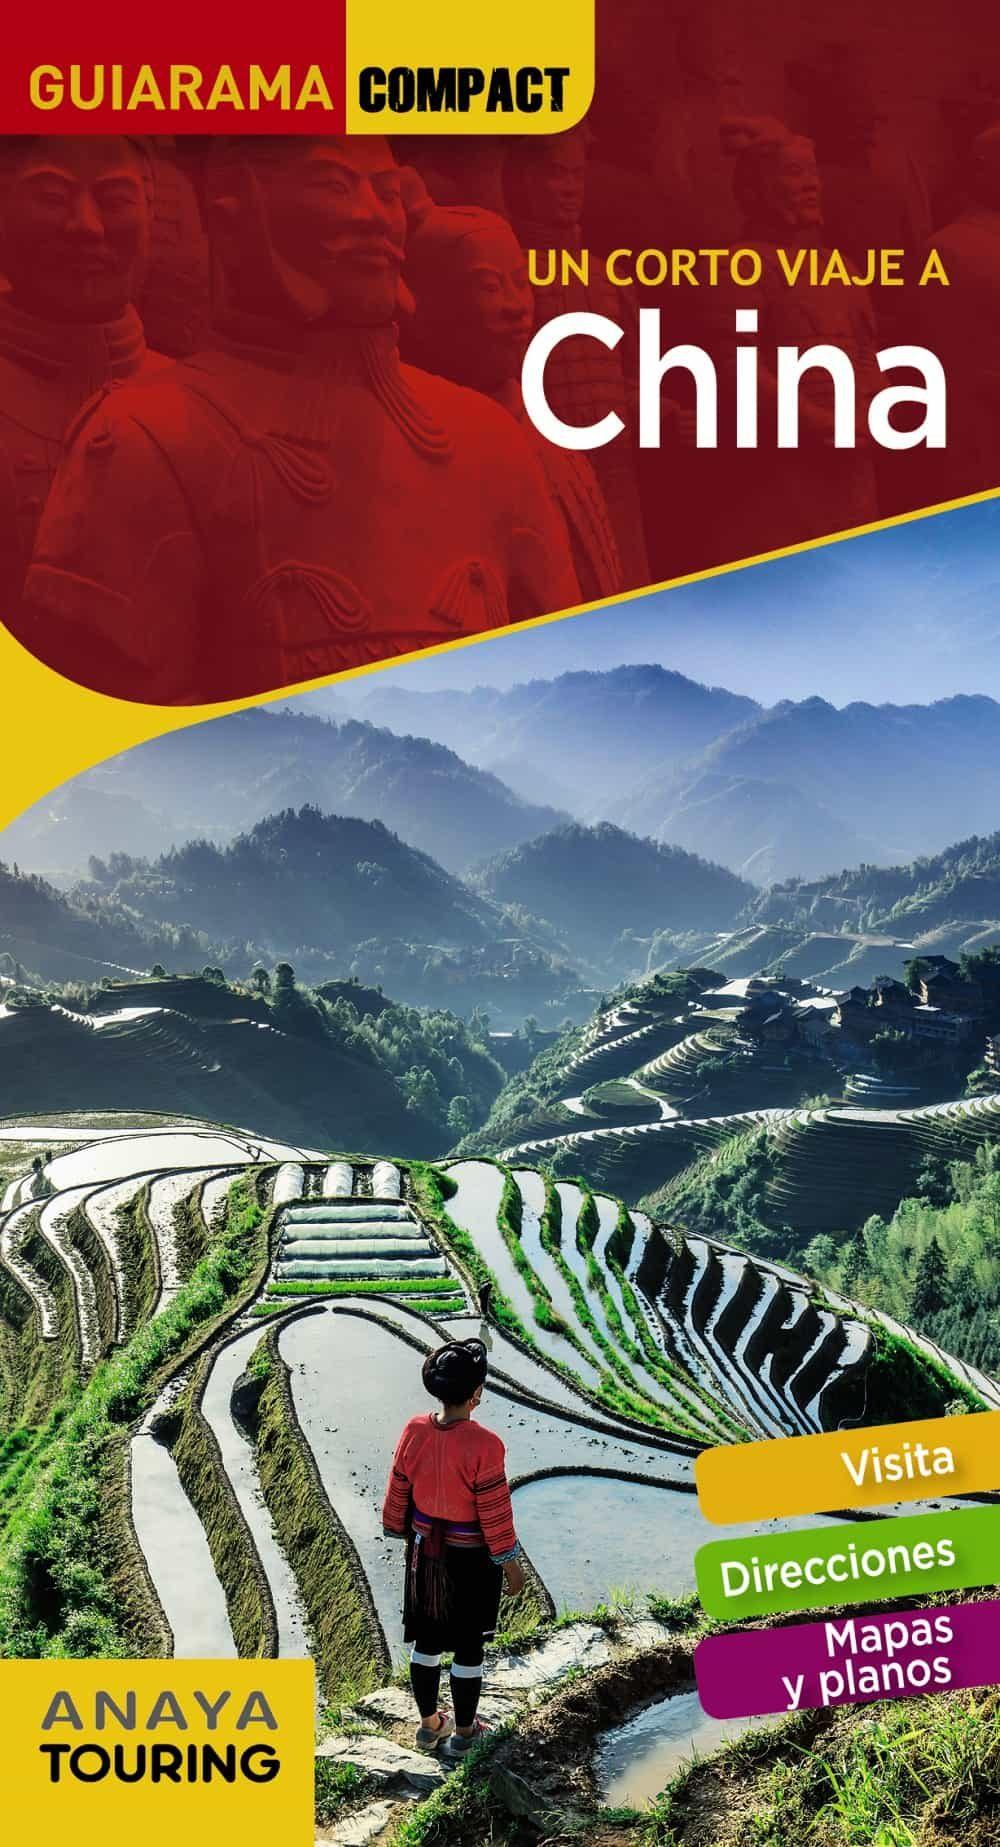 Un Corto Viaje A China 2018 (guiarama Compact) (2ª Ed.) por David Cabrera